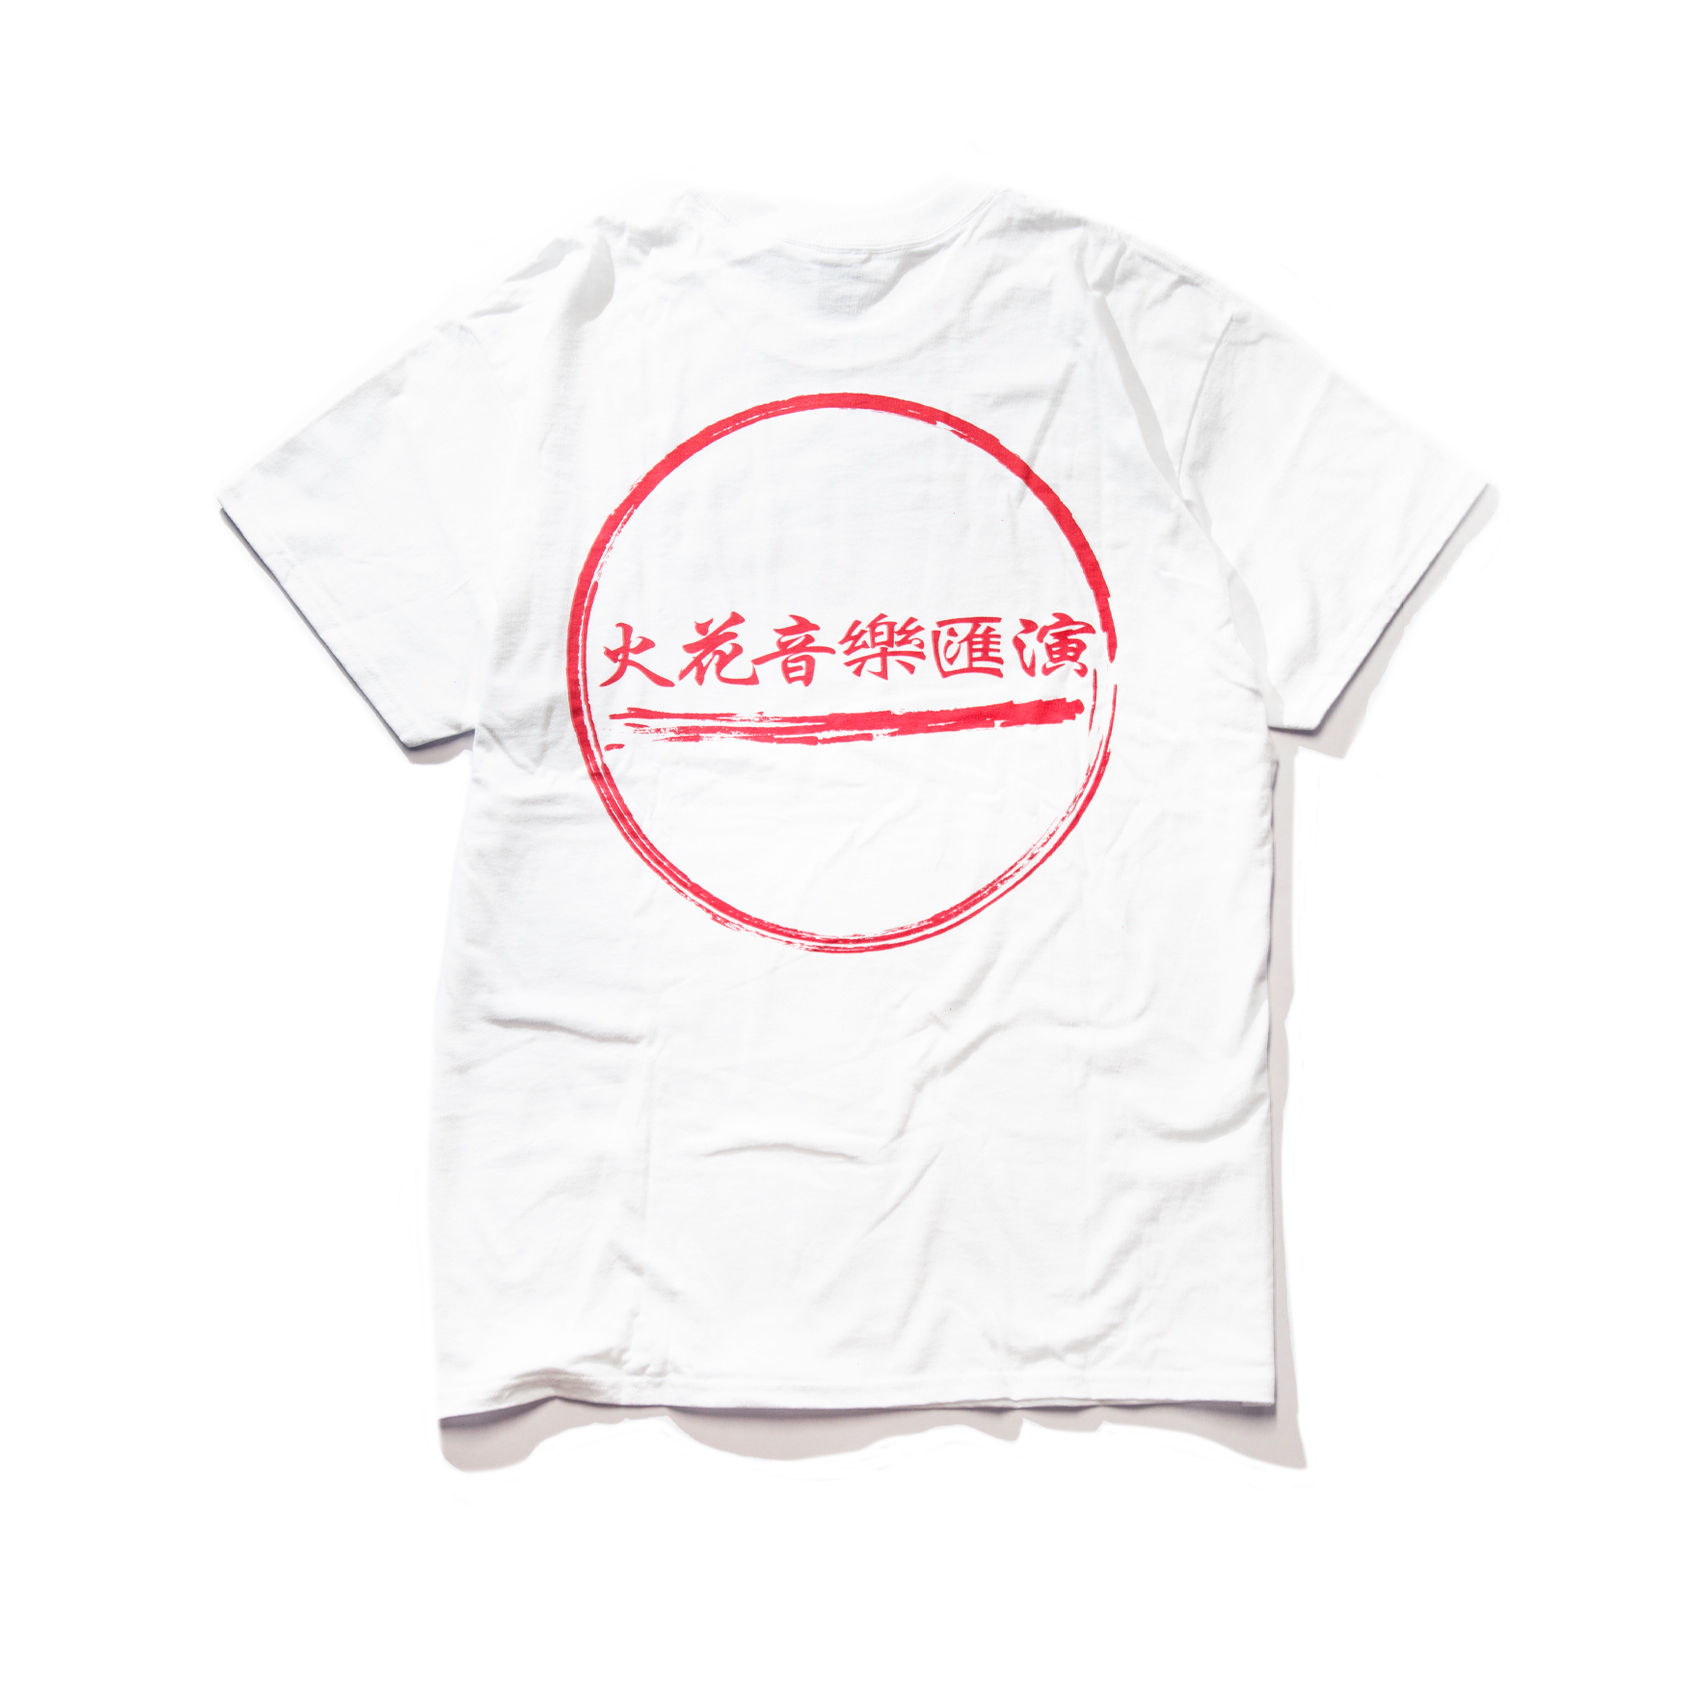 CIRCLE TEE(White)